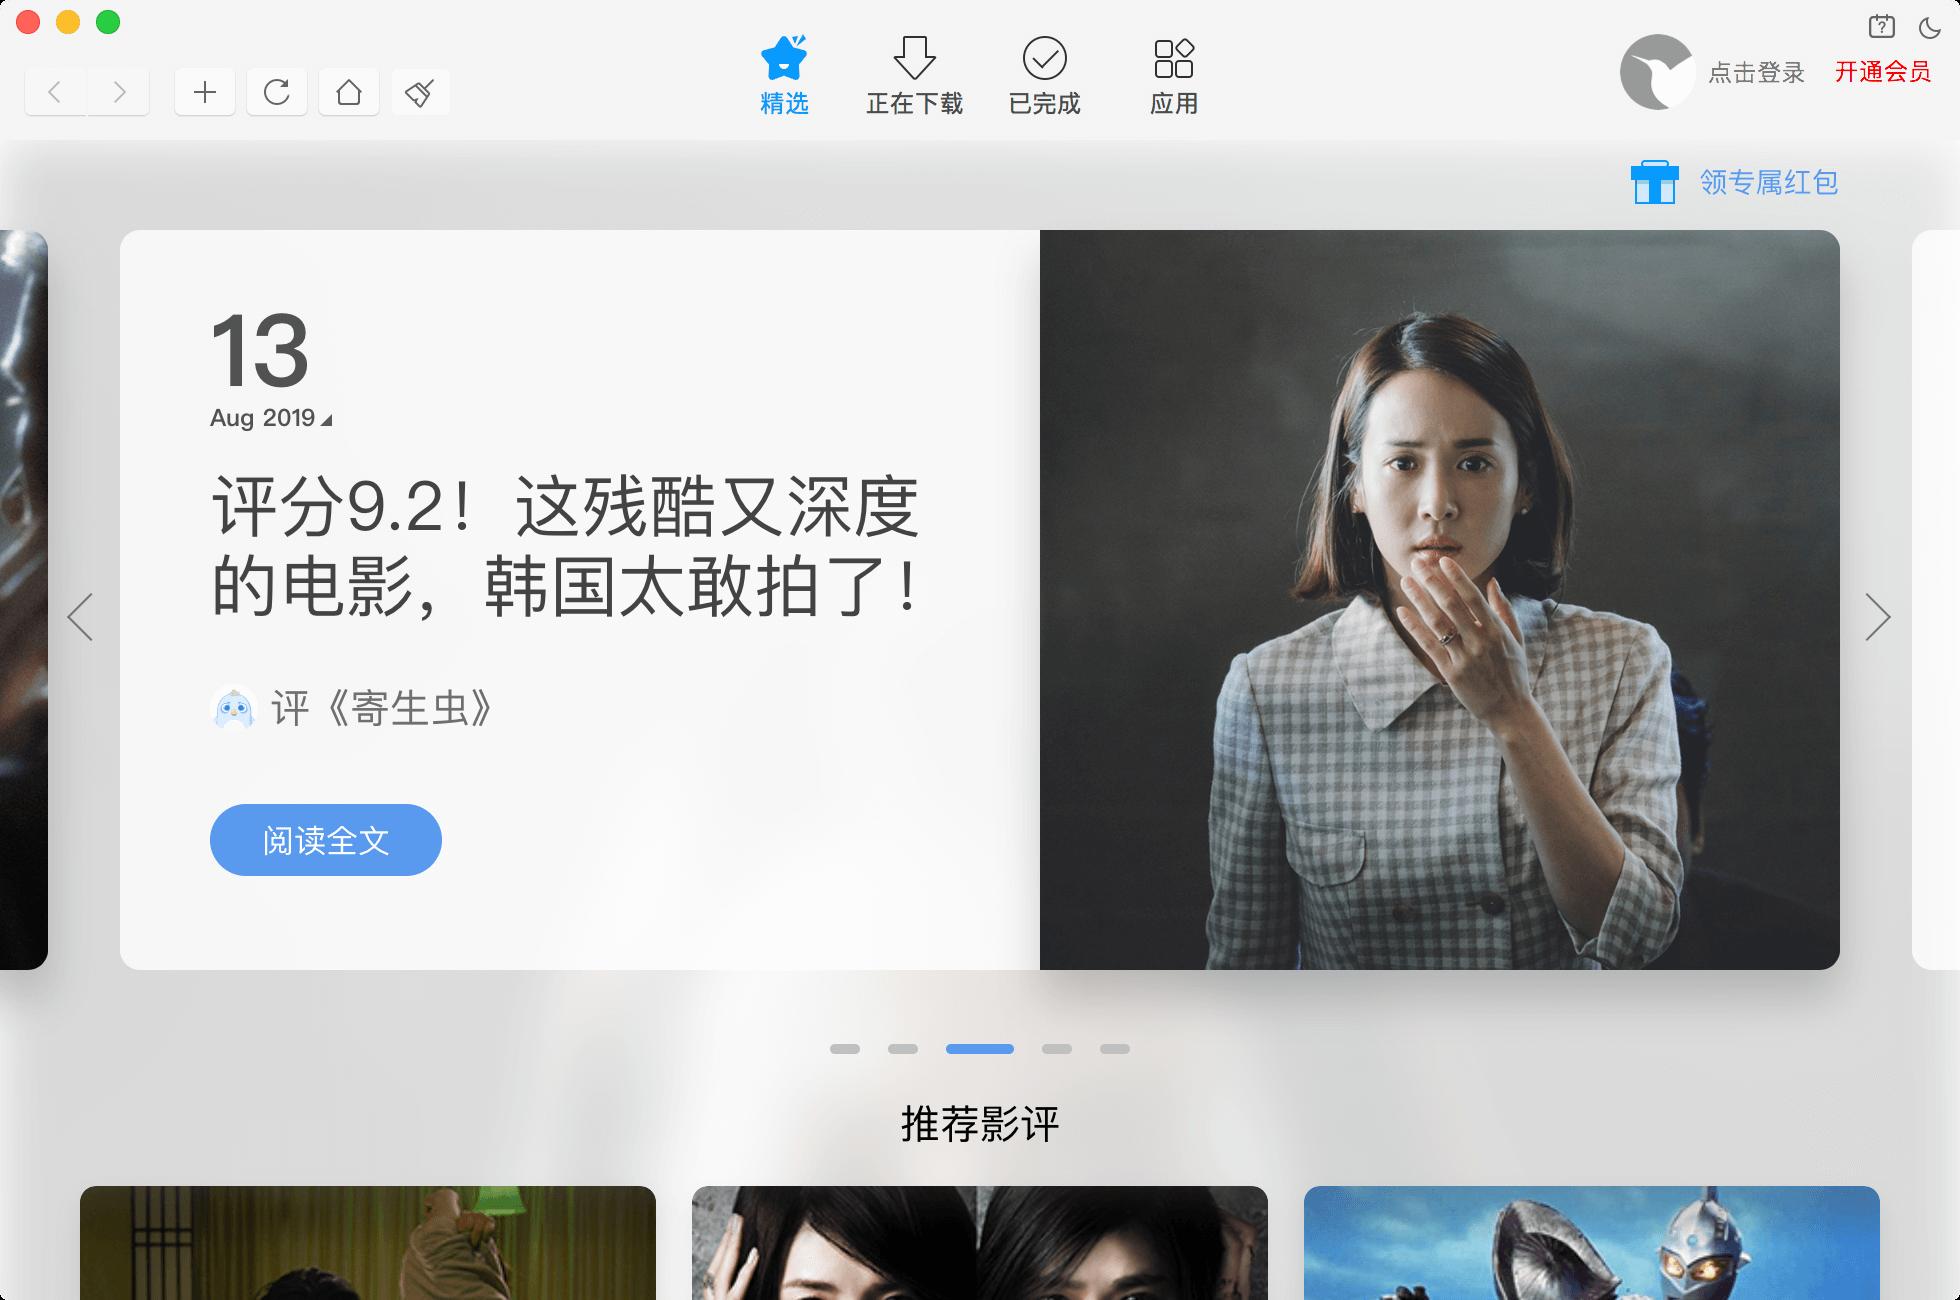 迅雷破解版 for mac 666中文版